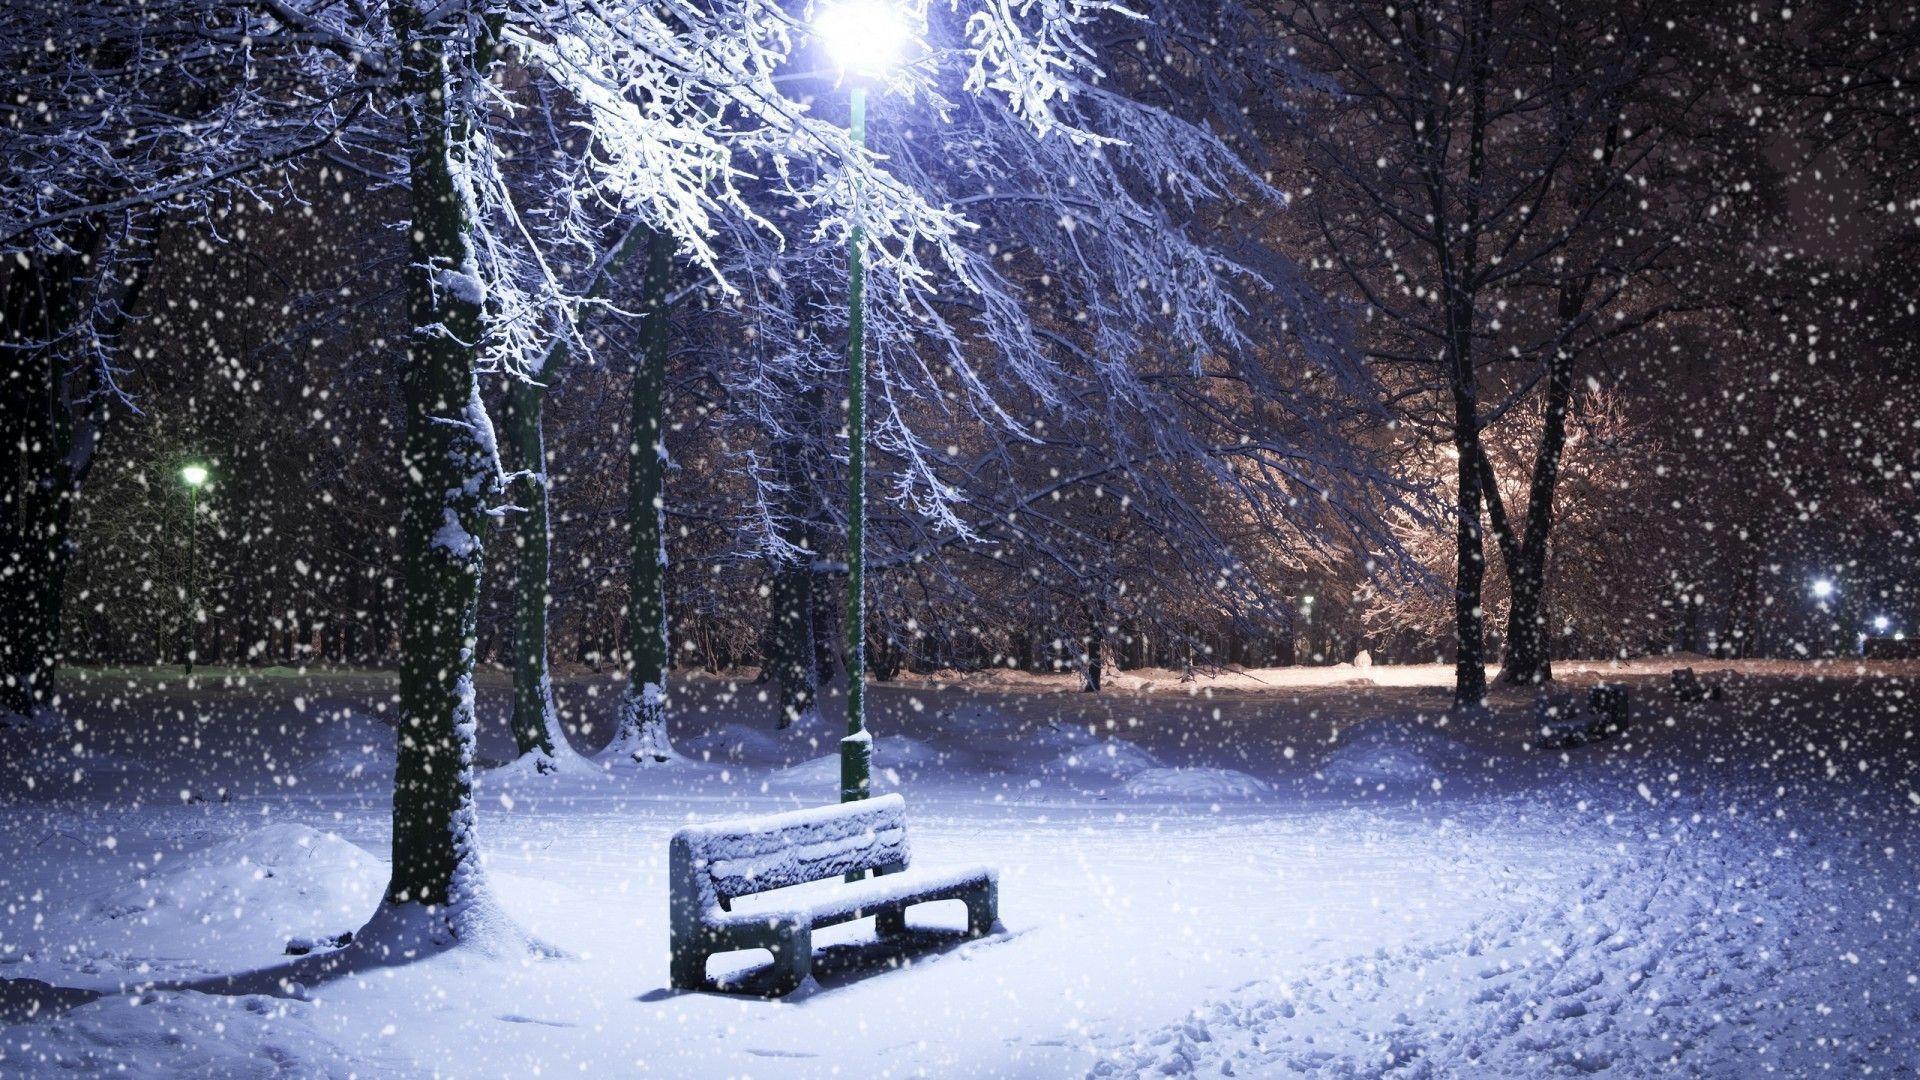 Hd Snow Wallpaper 82 Images